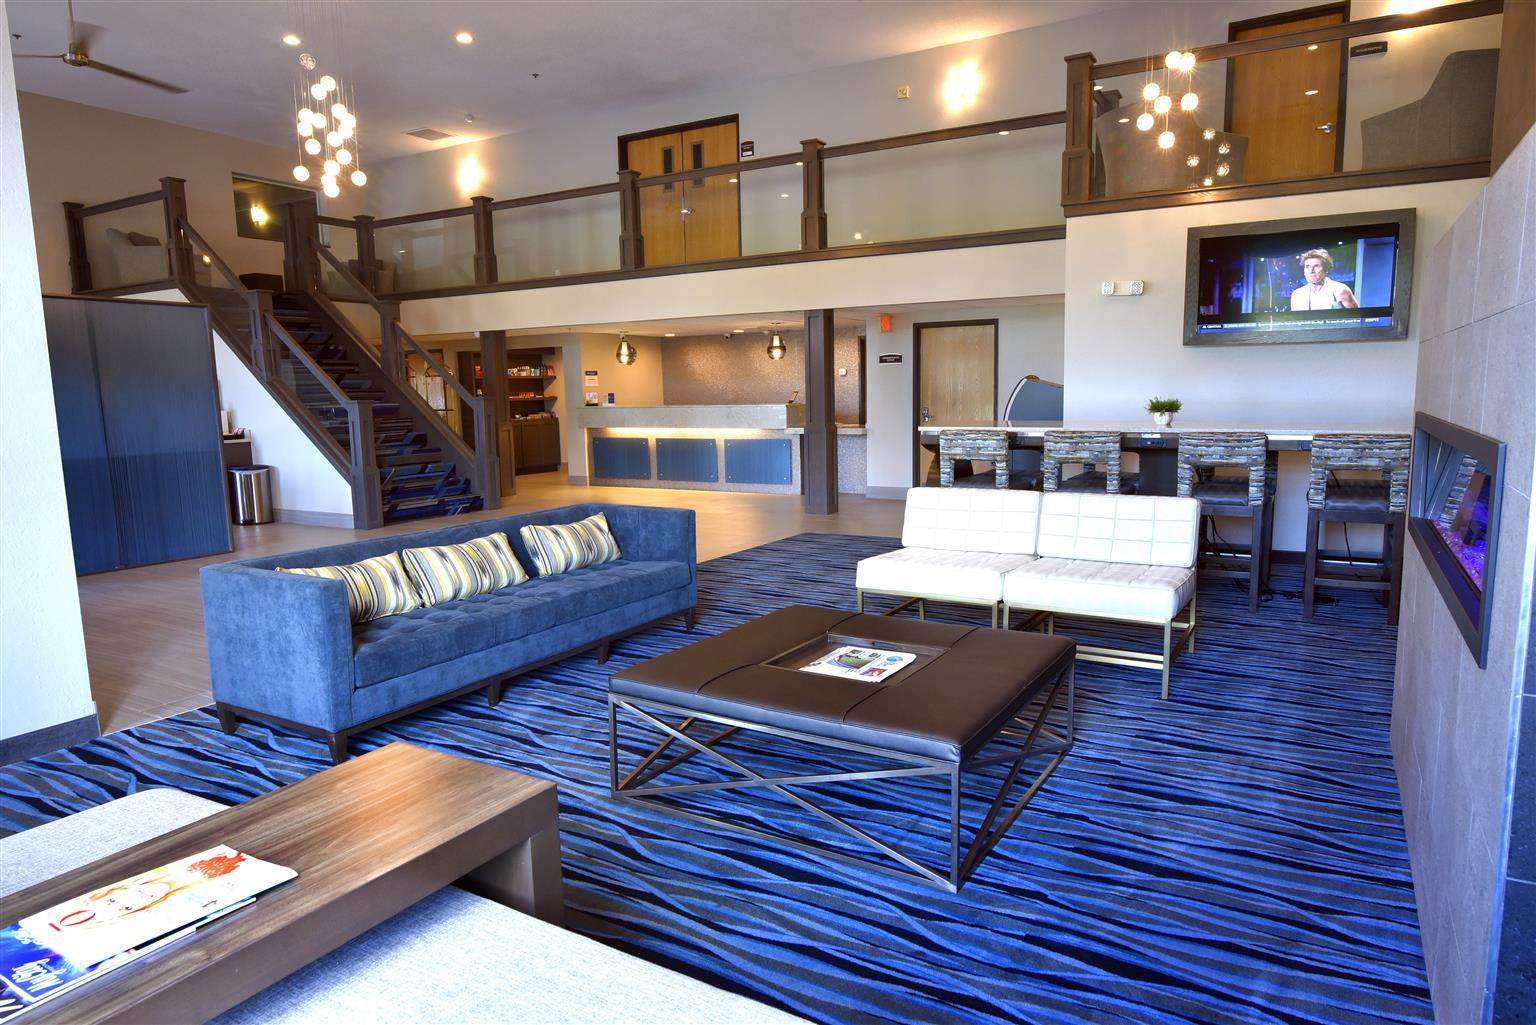 Baymont Inn & Suites Flint, Michigan